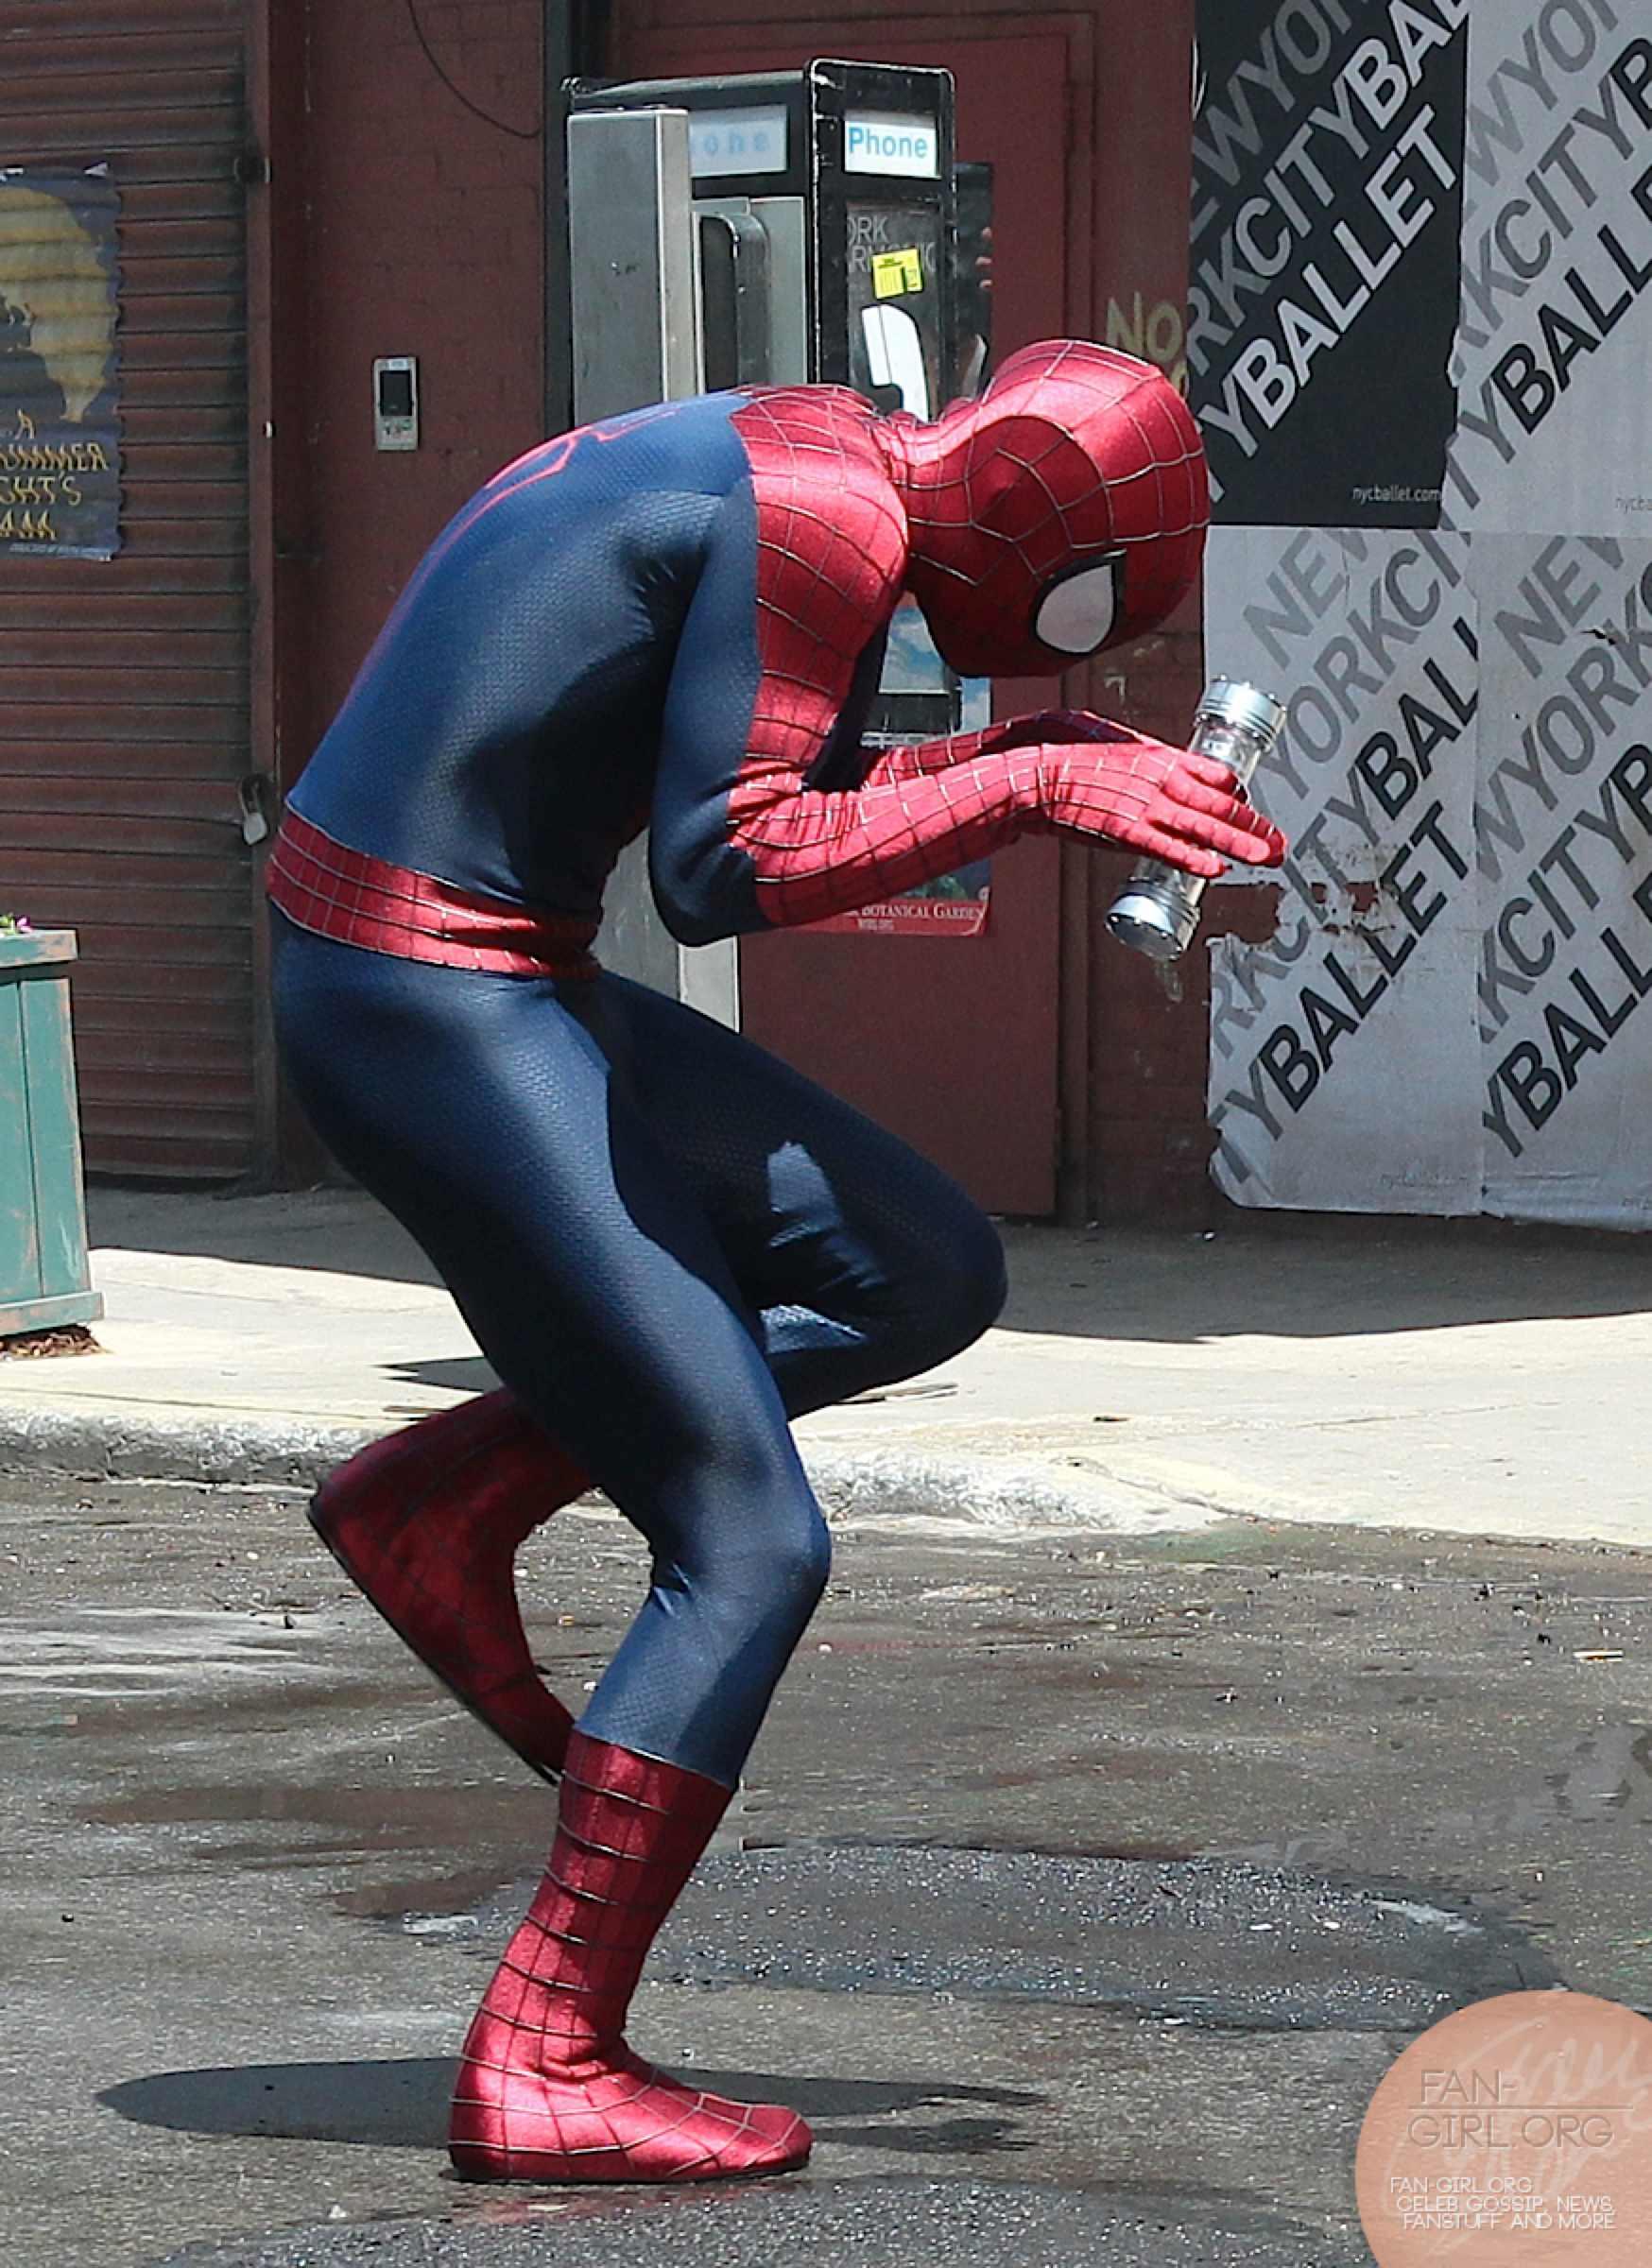 tournage-amazing-spider-man-2-rhino-giamatti9